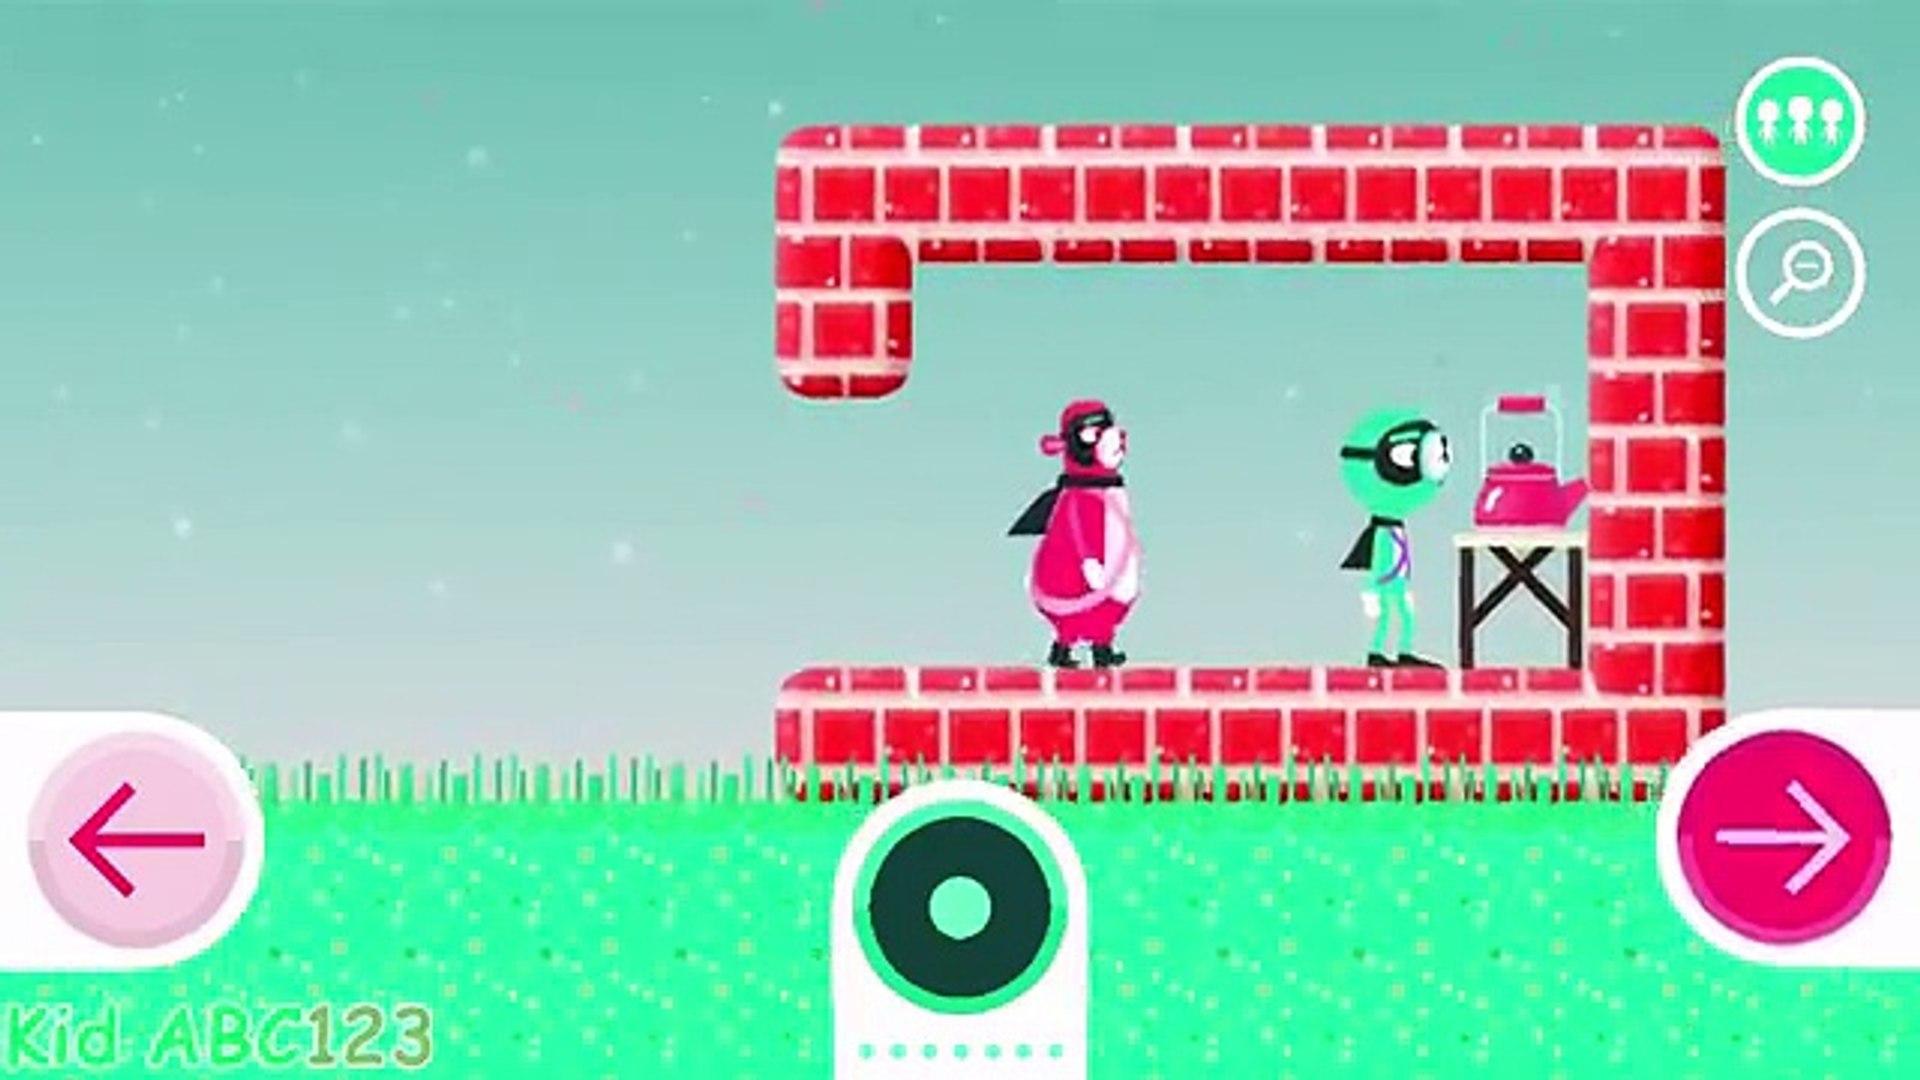 Toca Blocks Game (Toca Boca) Part 3 - Education Apps for Kids